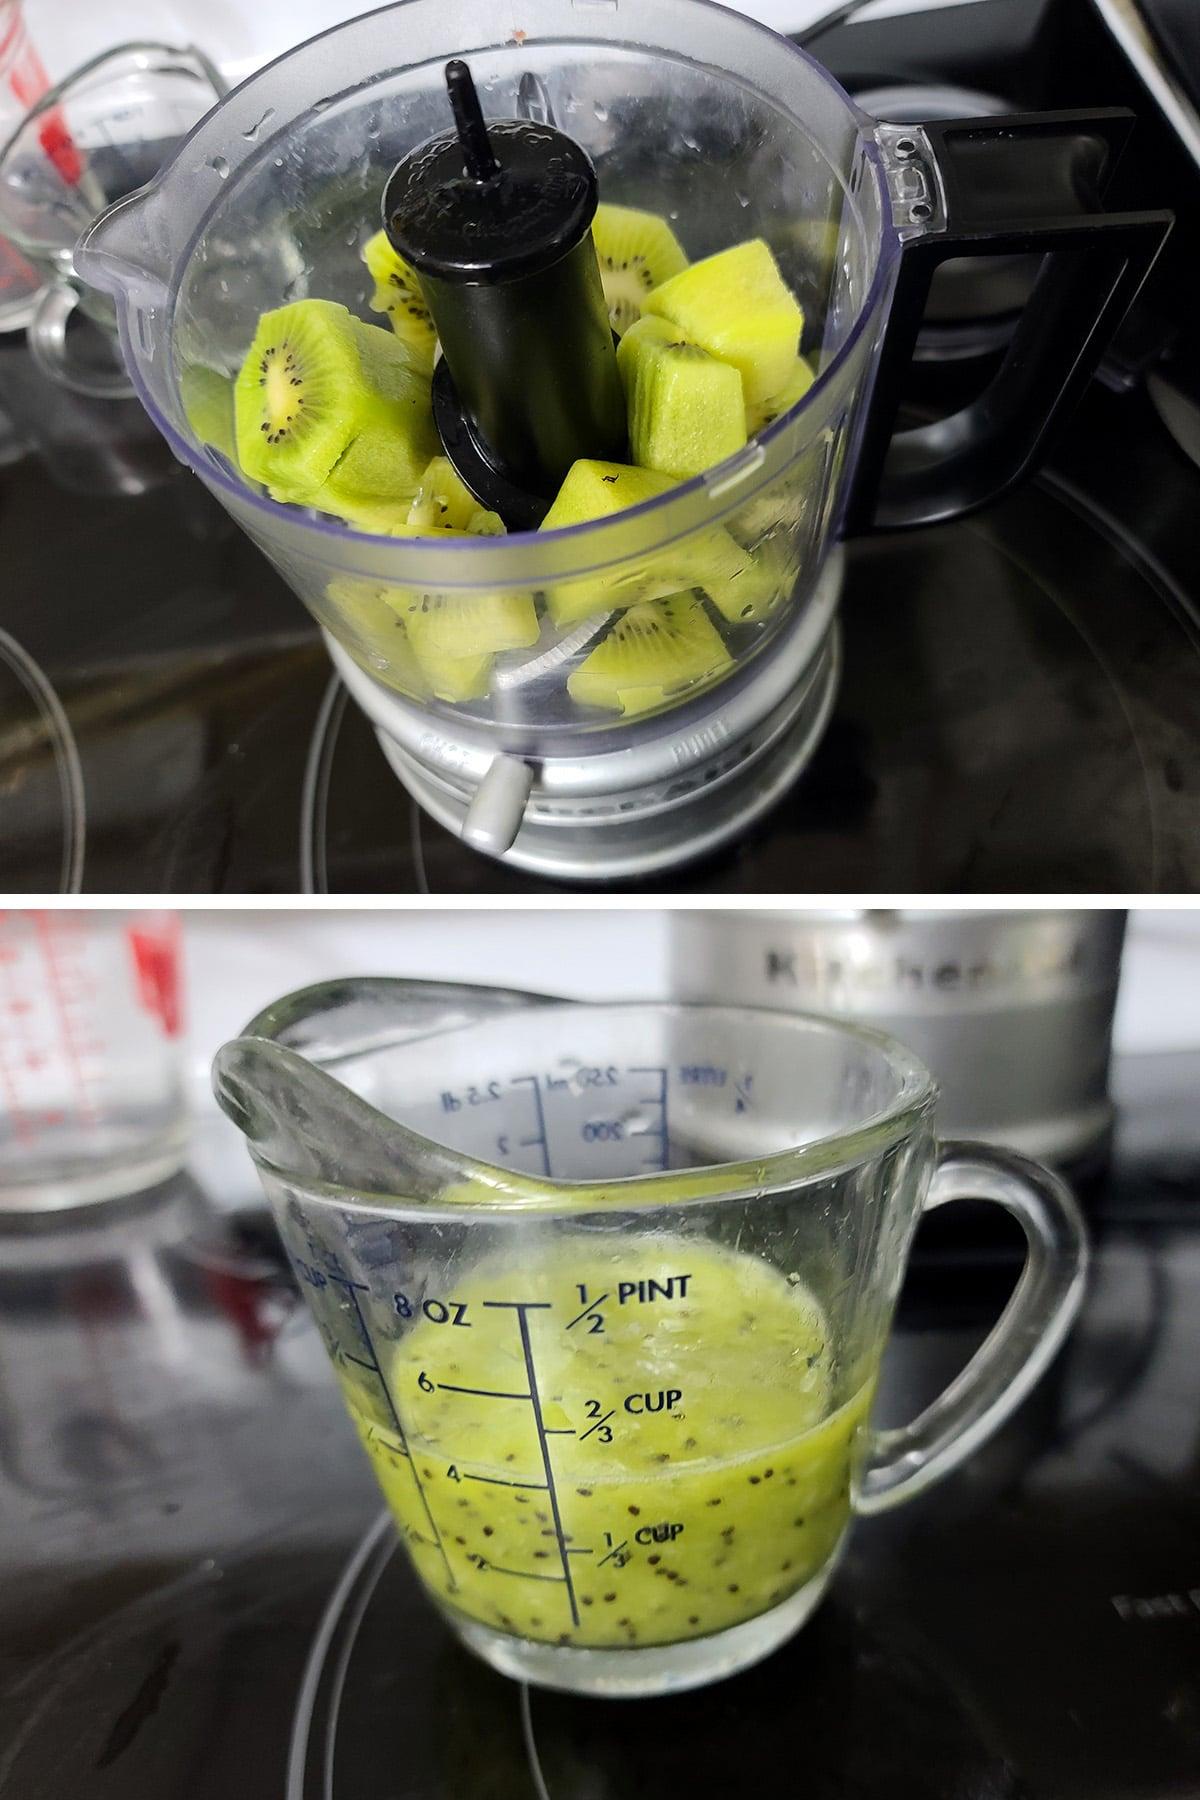 Chopped kiwi being pureed in a mini food processor.